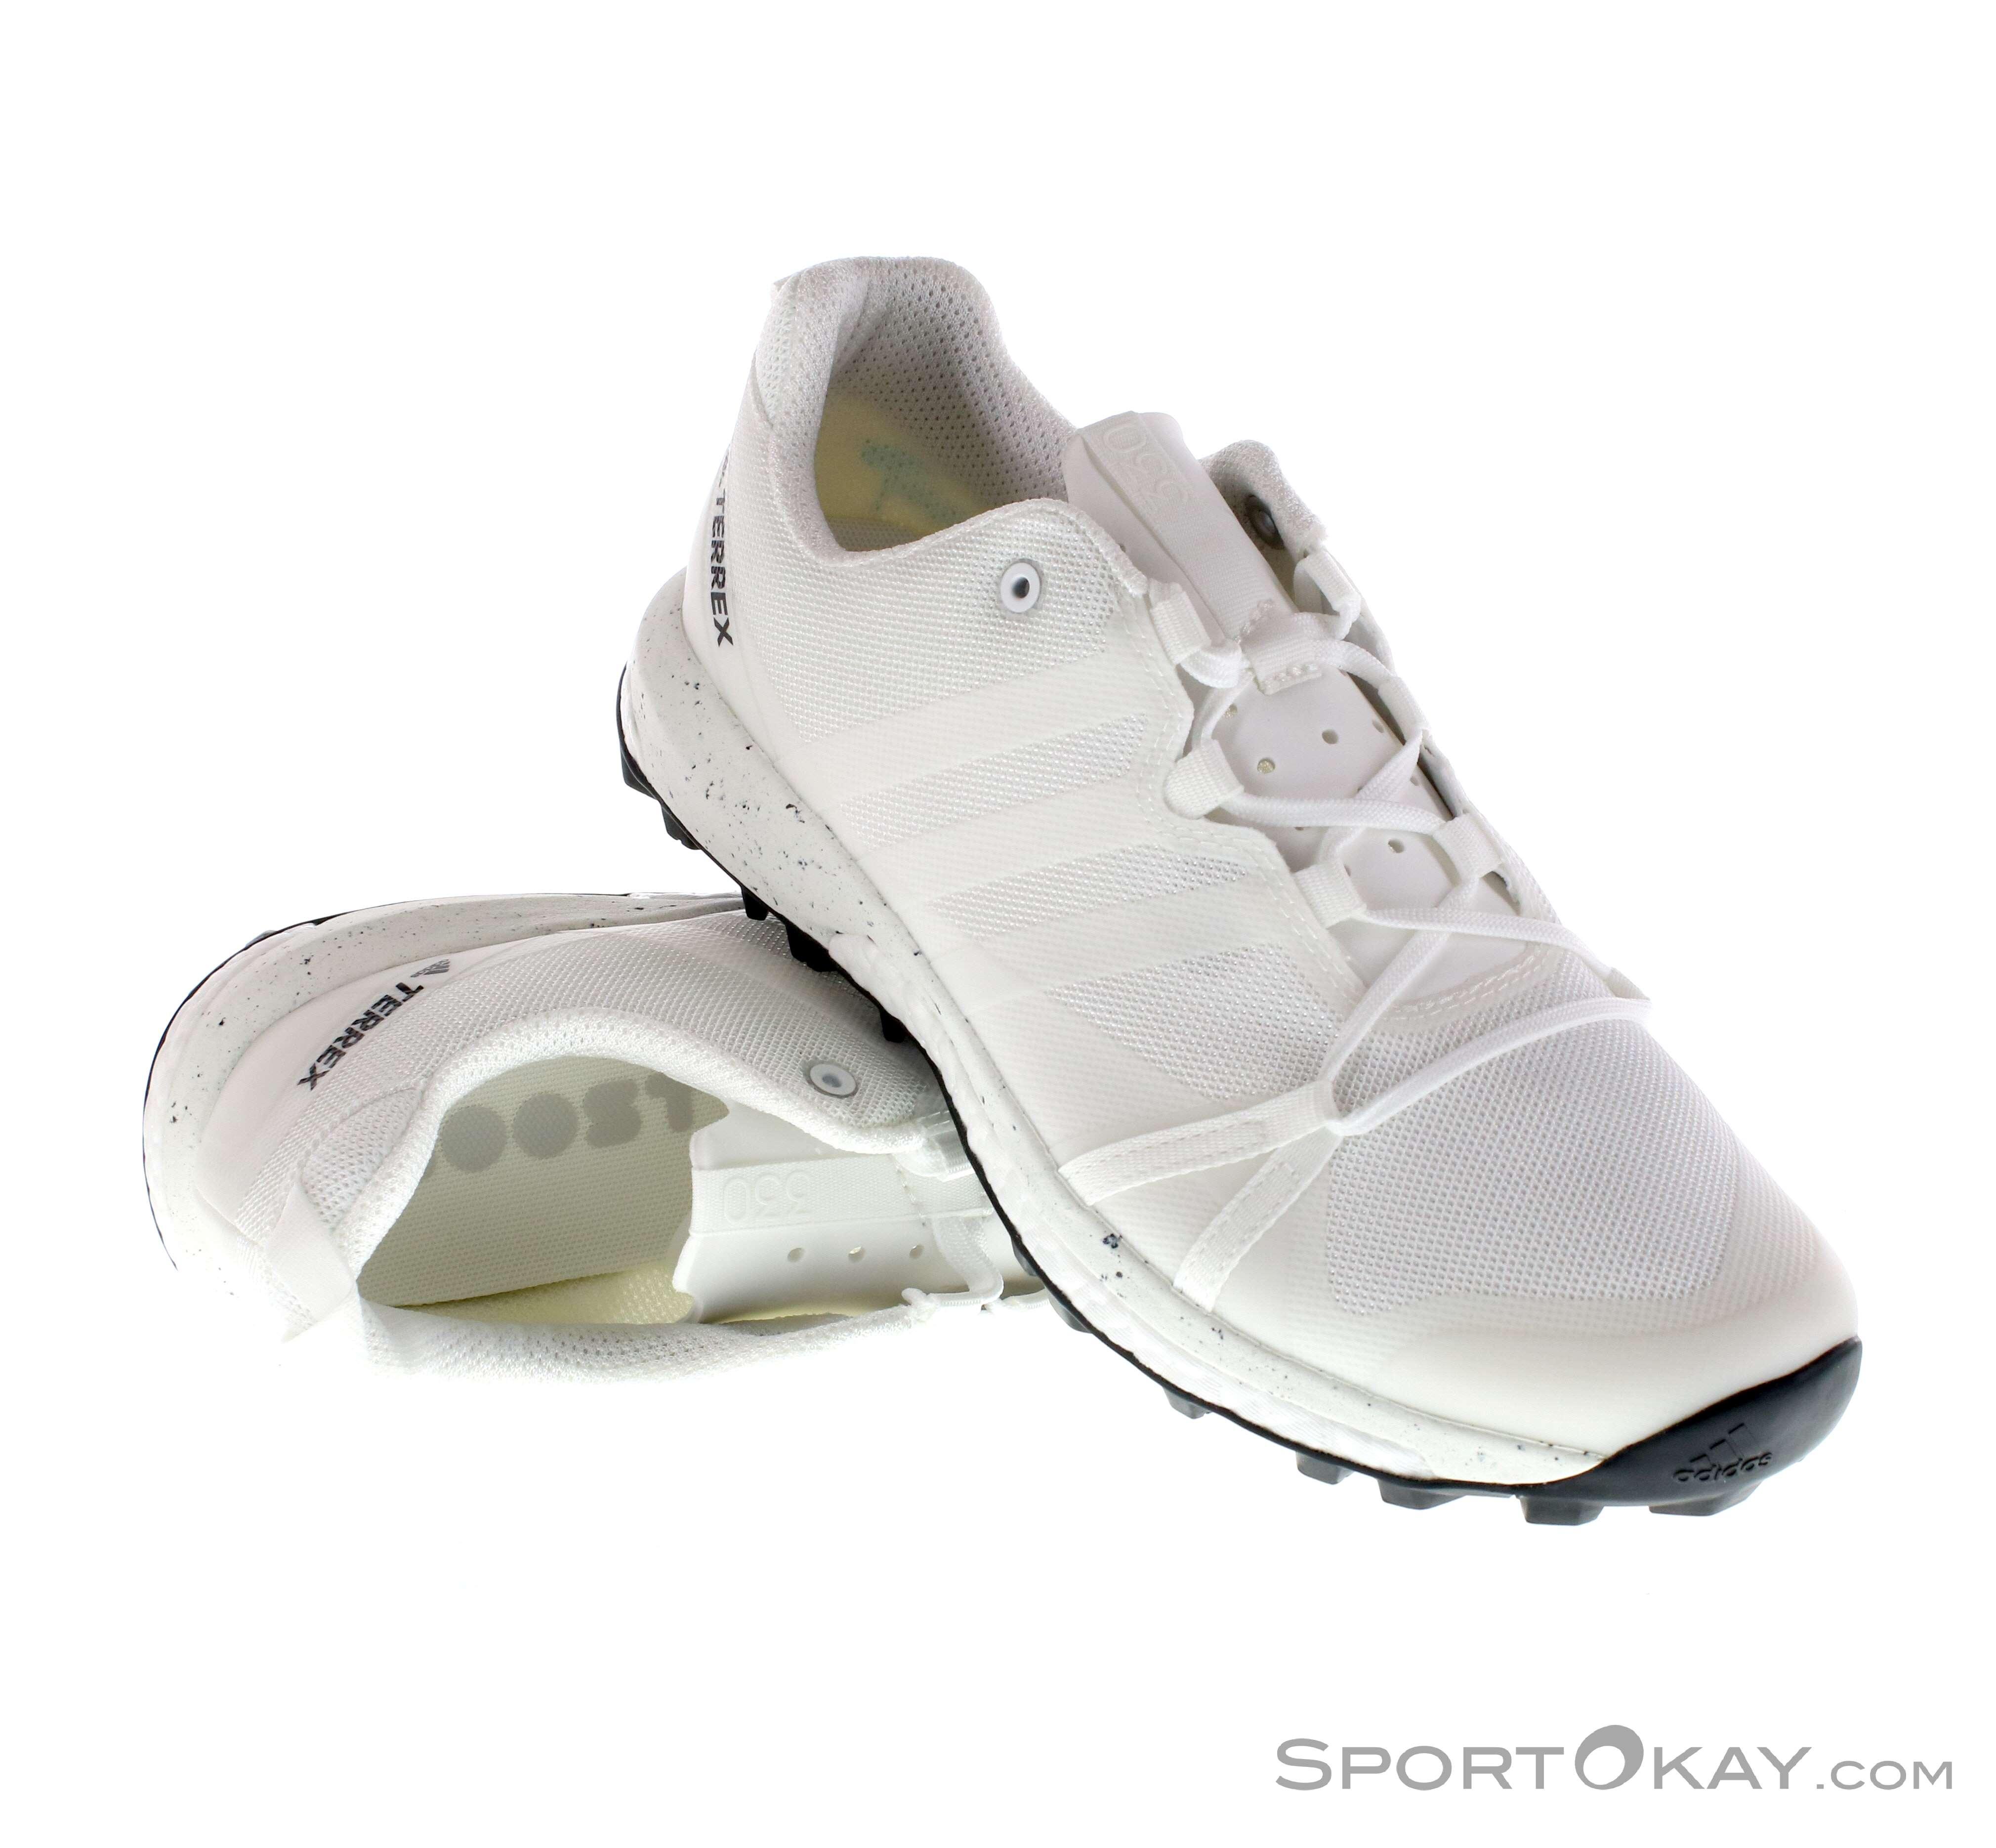 32dcd5ed9e3c9 adidas Terrex Agravic Mens Trail Running Shoes, adidas, White, , Male, 0002